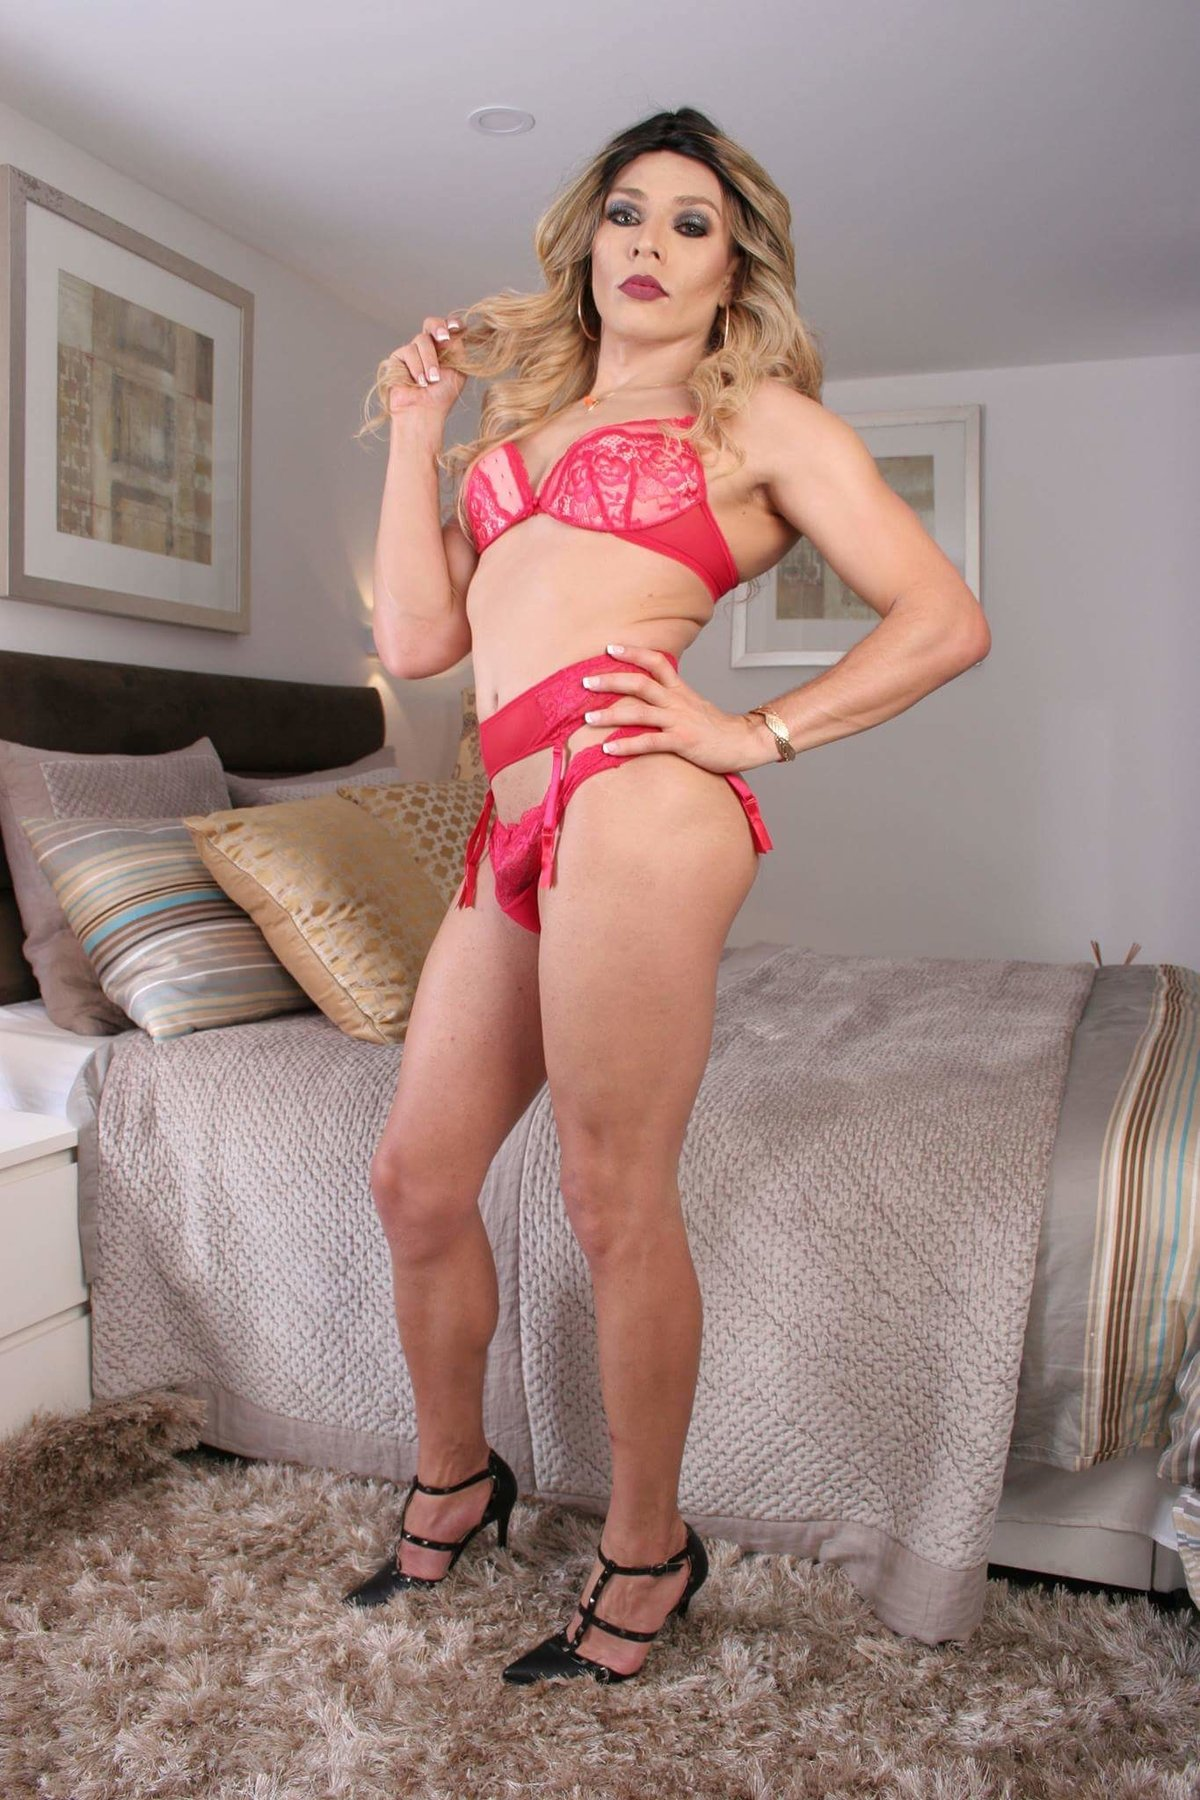 Sasha XXL, Brazilian Transsexual escort in Newcastle upon Tyne